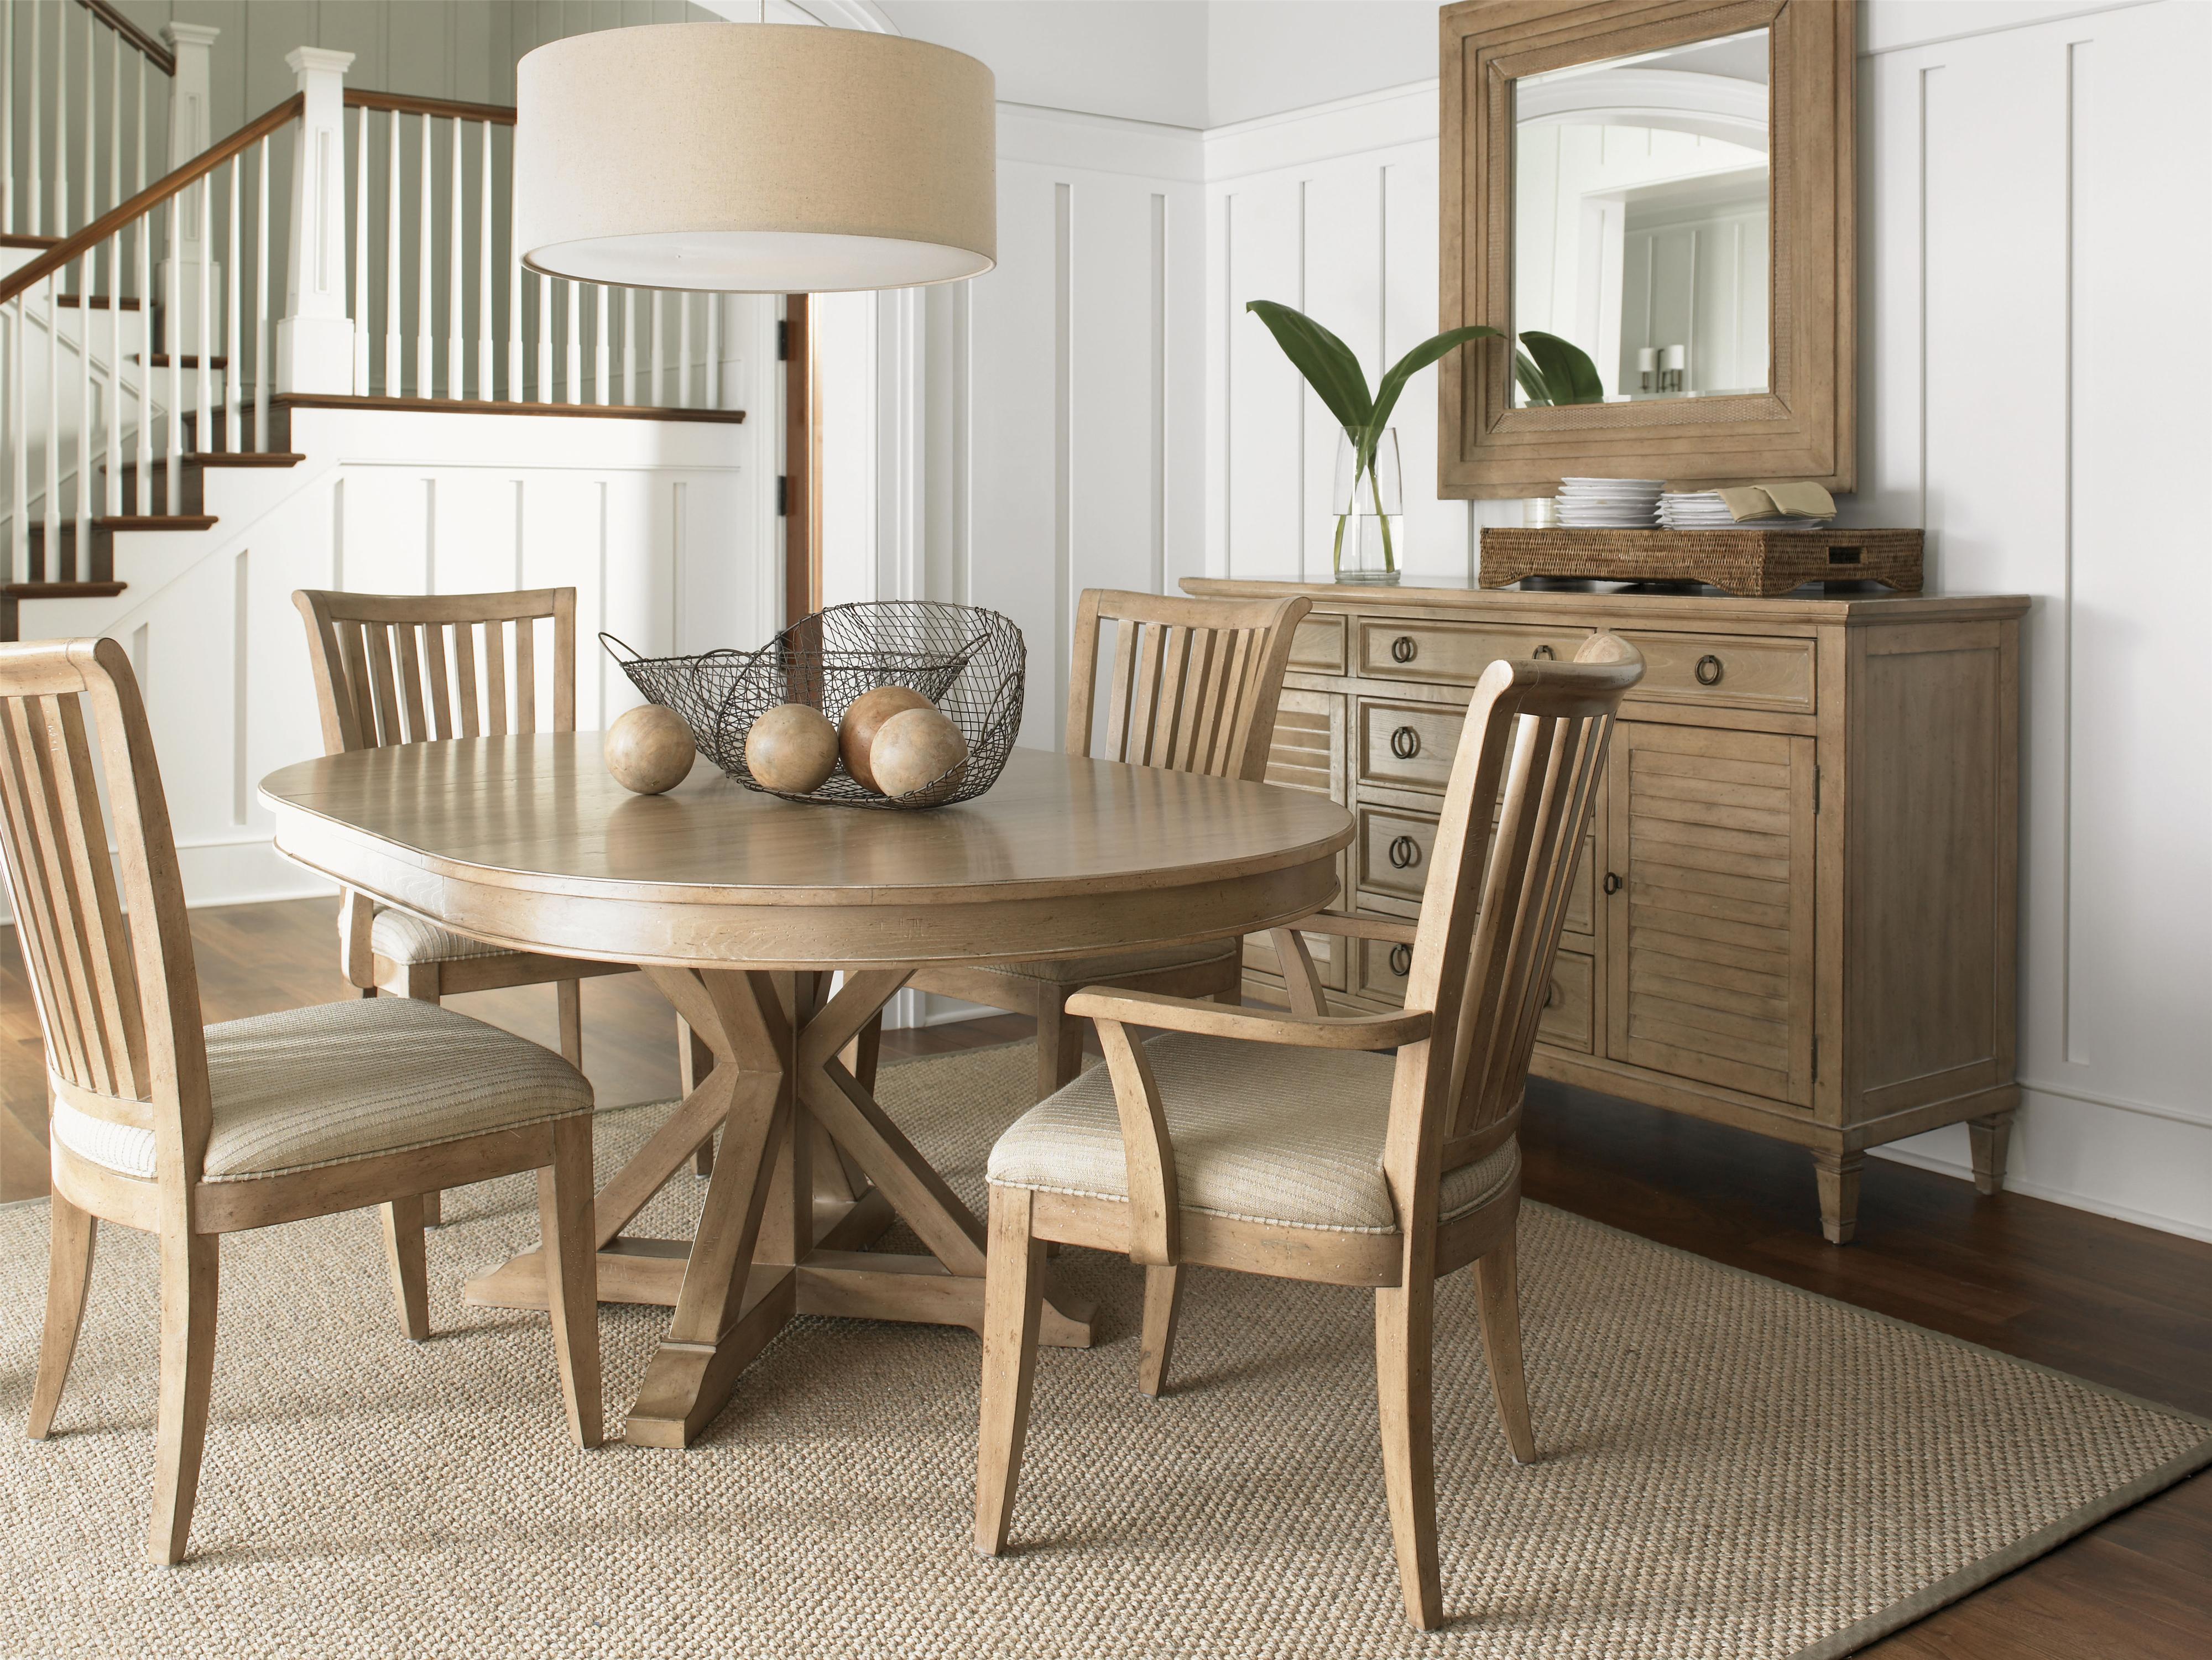 Lexington Monterey Sands Formal Dining Room Group - Item Number: 830 F Dining Room Group 3